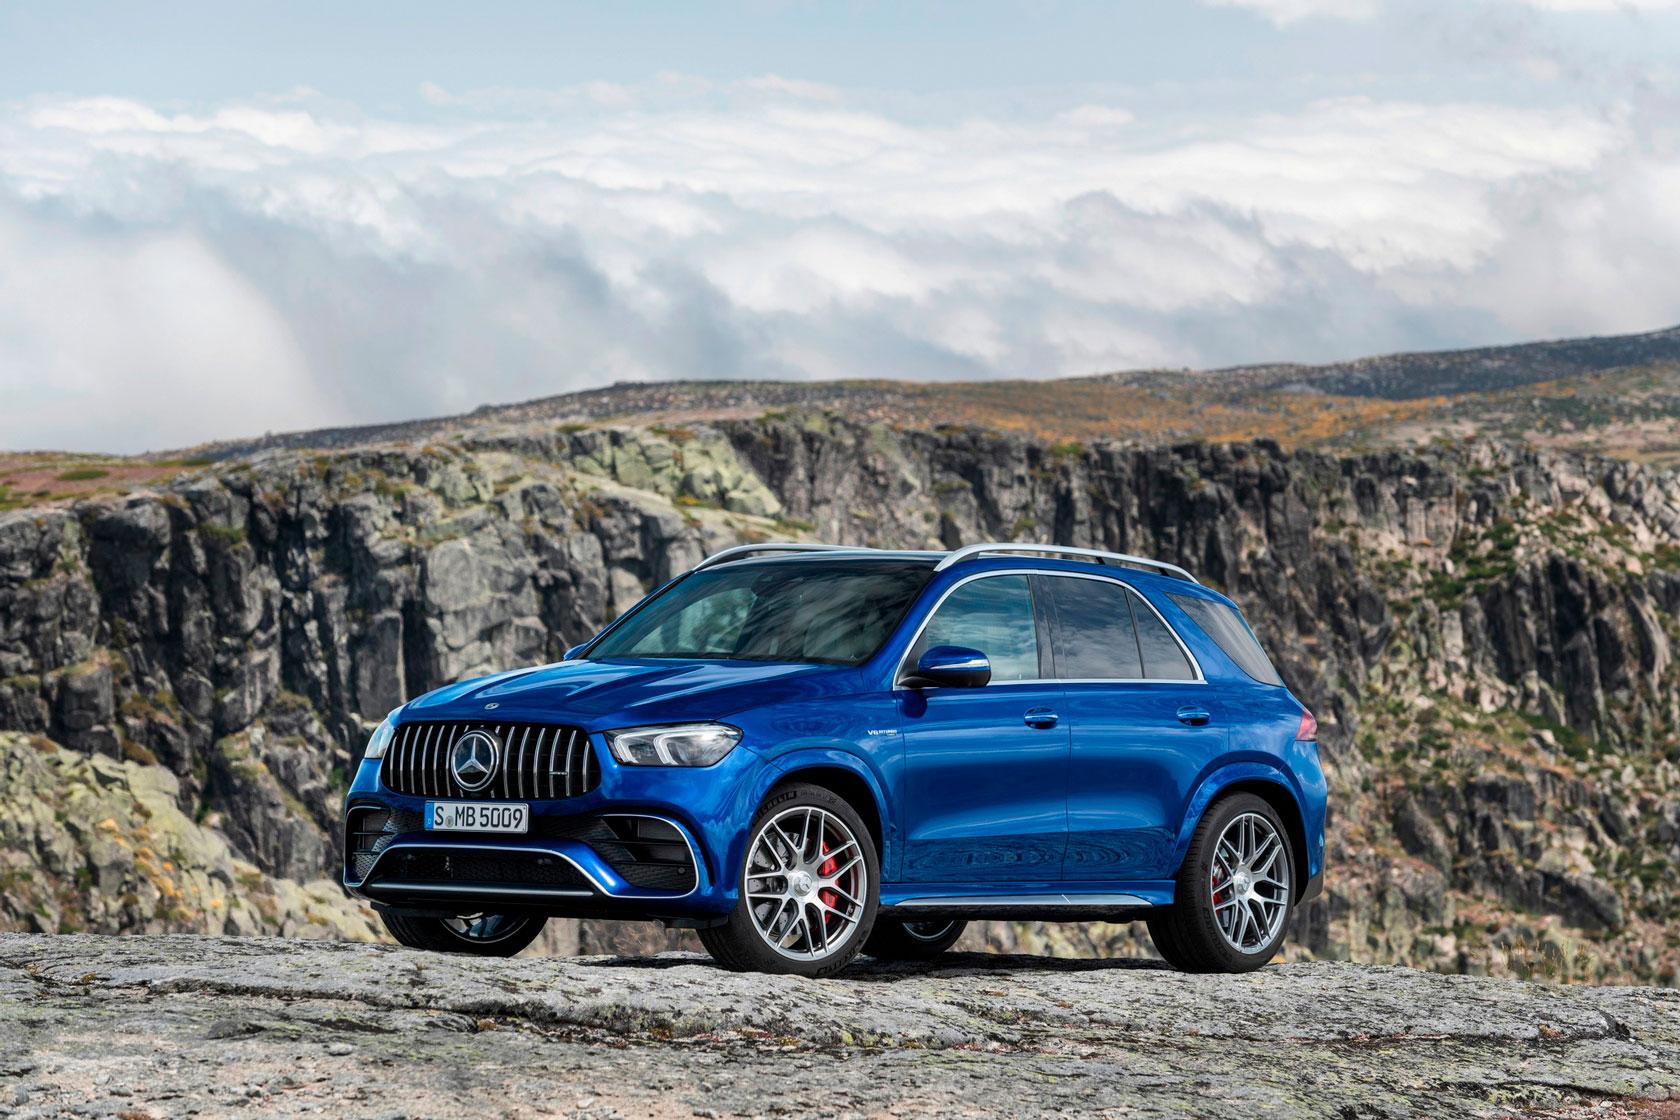 Mercedes-AMG GLE та GLS 63 початок продажів